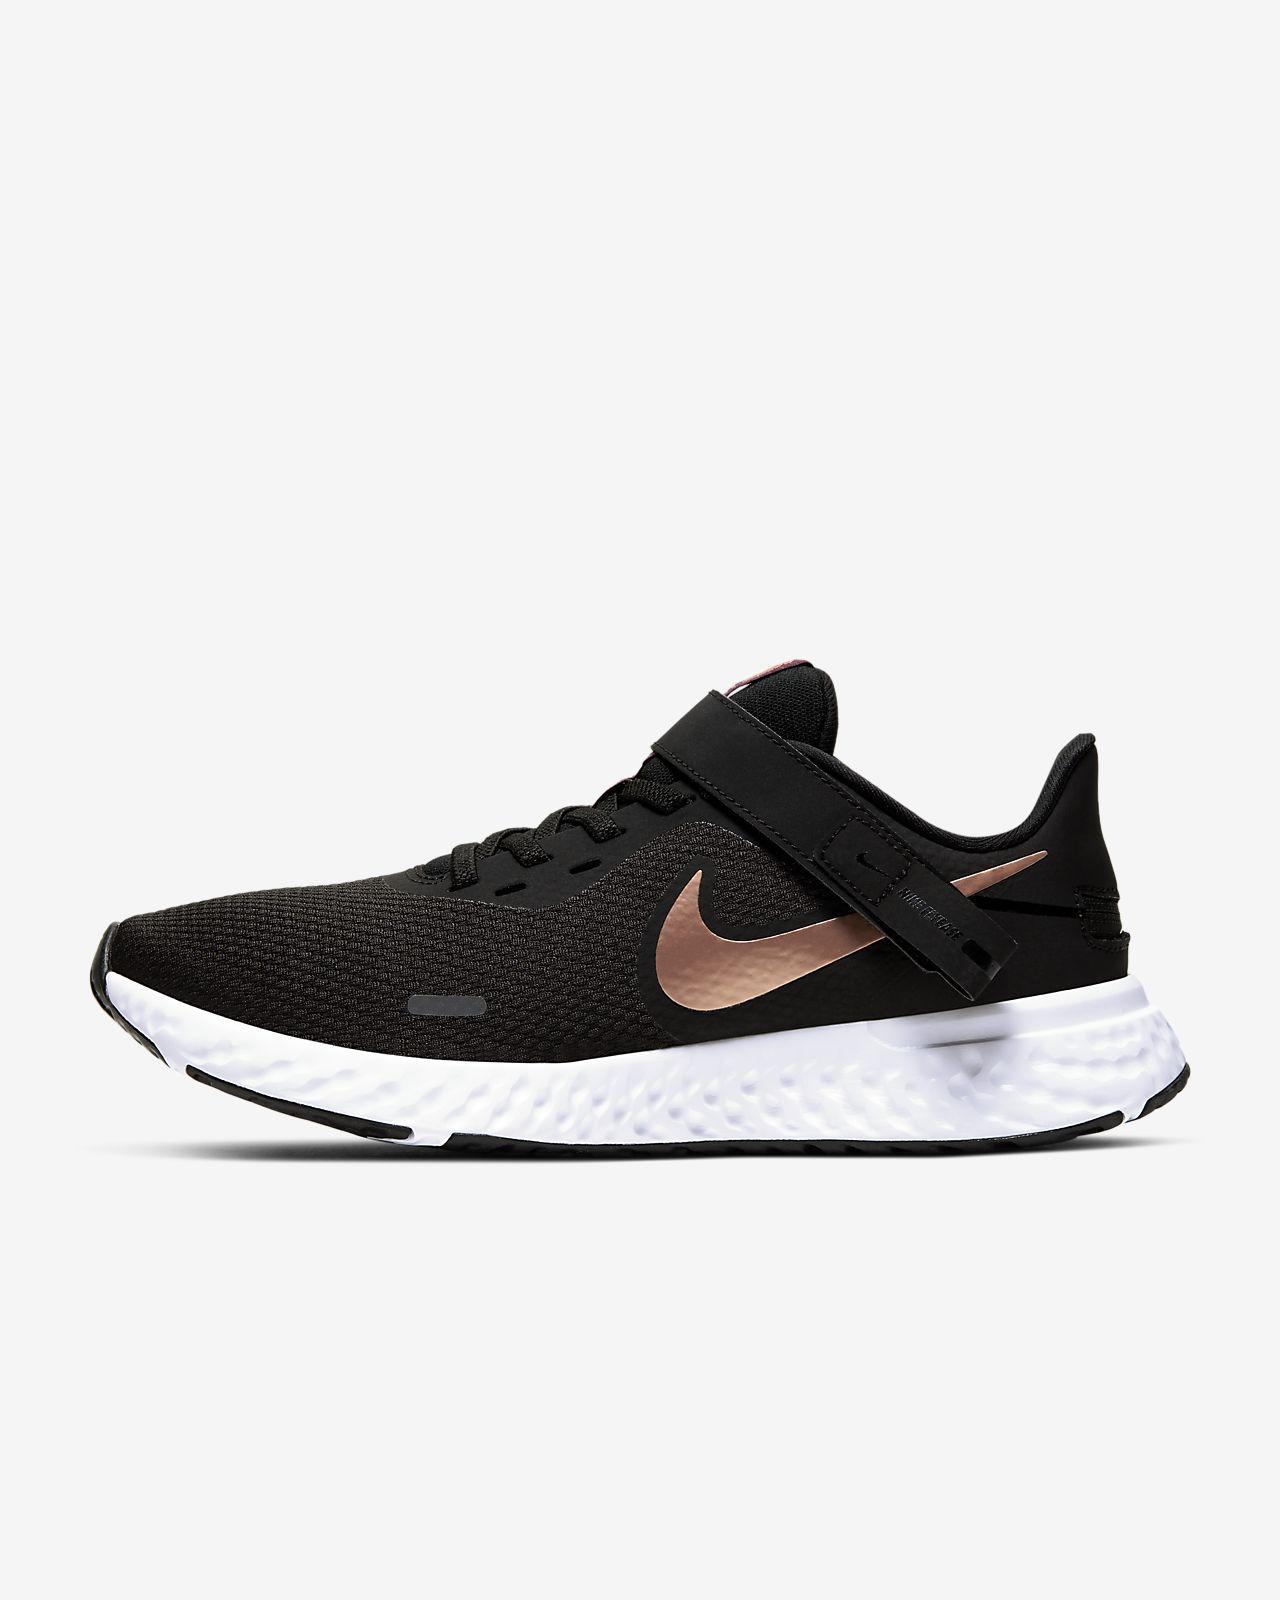 Sapatilhas de running Nike Revolution 5 FlyEase para mulher